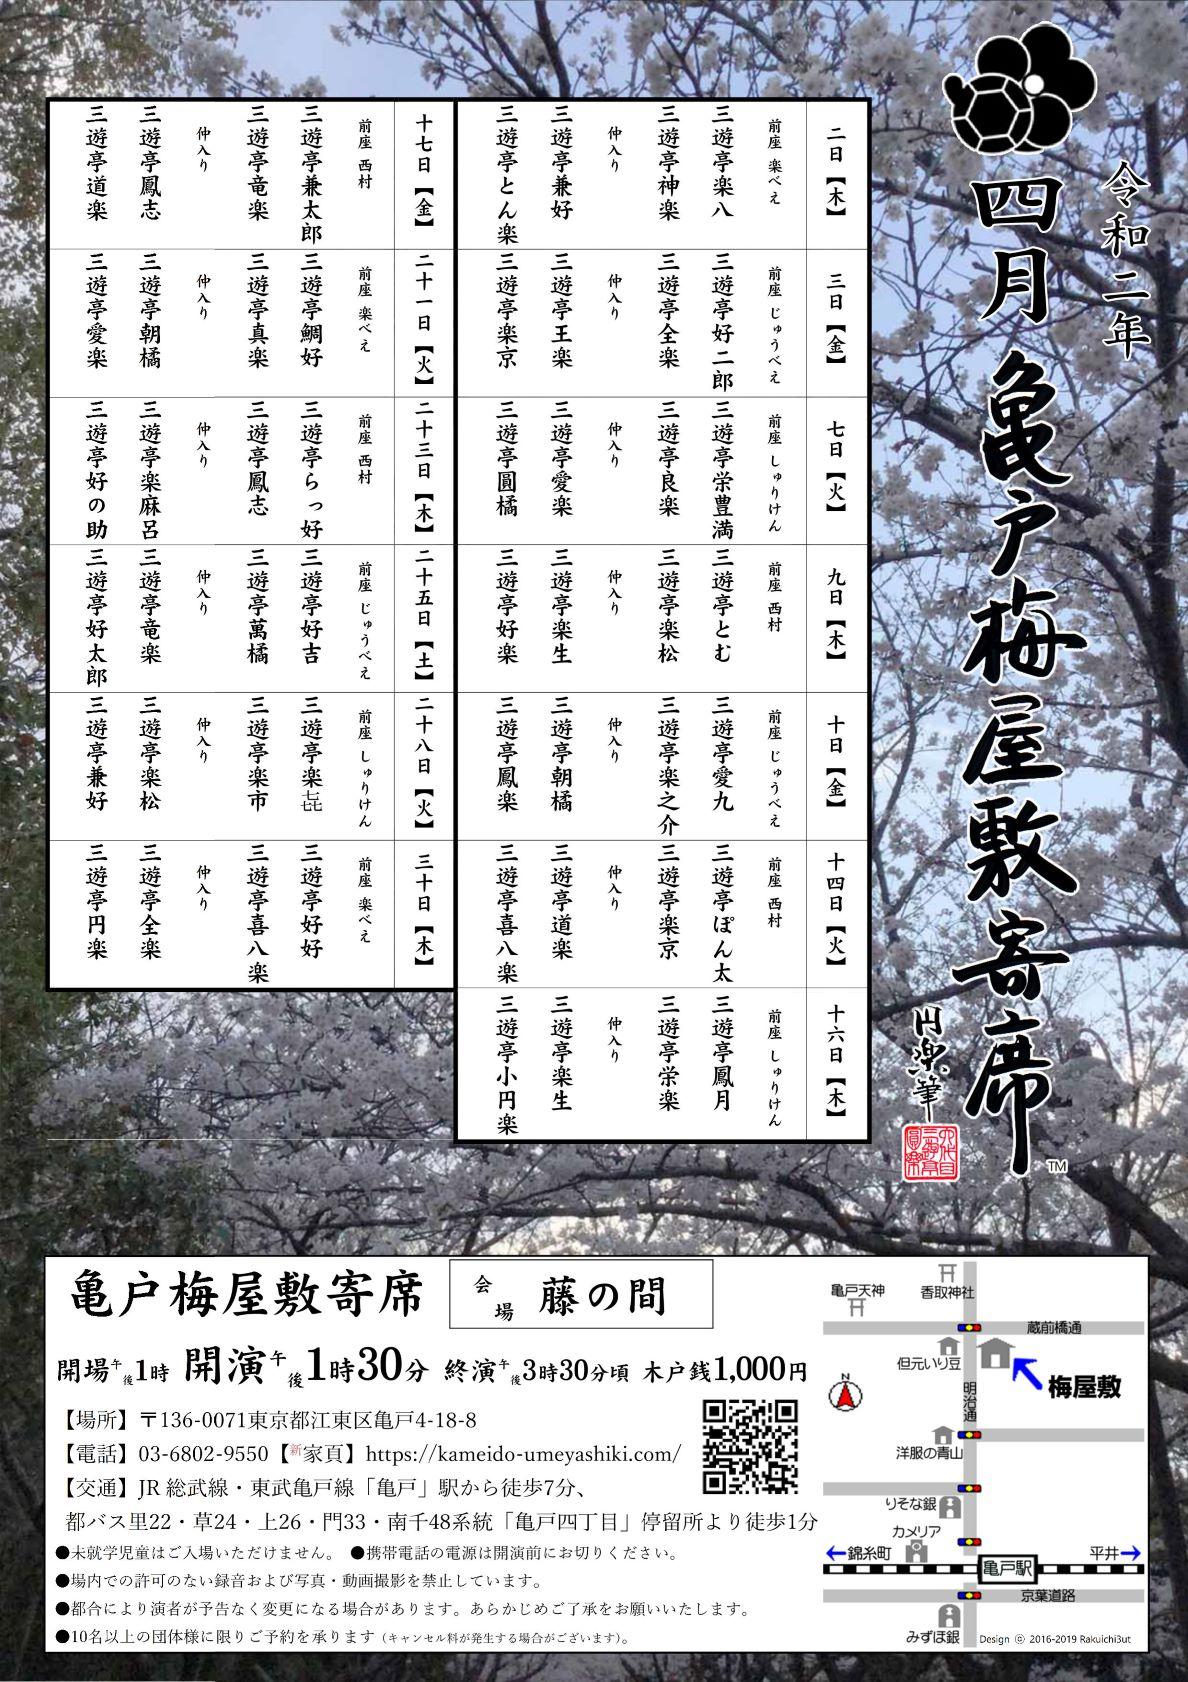 Kameido Umeyashiki variety hall [April]